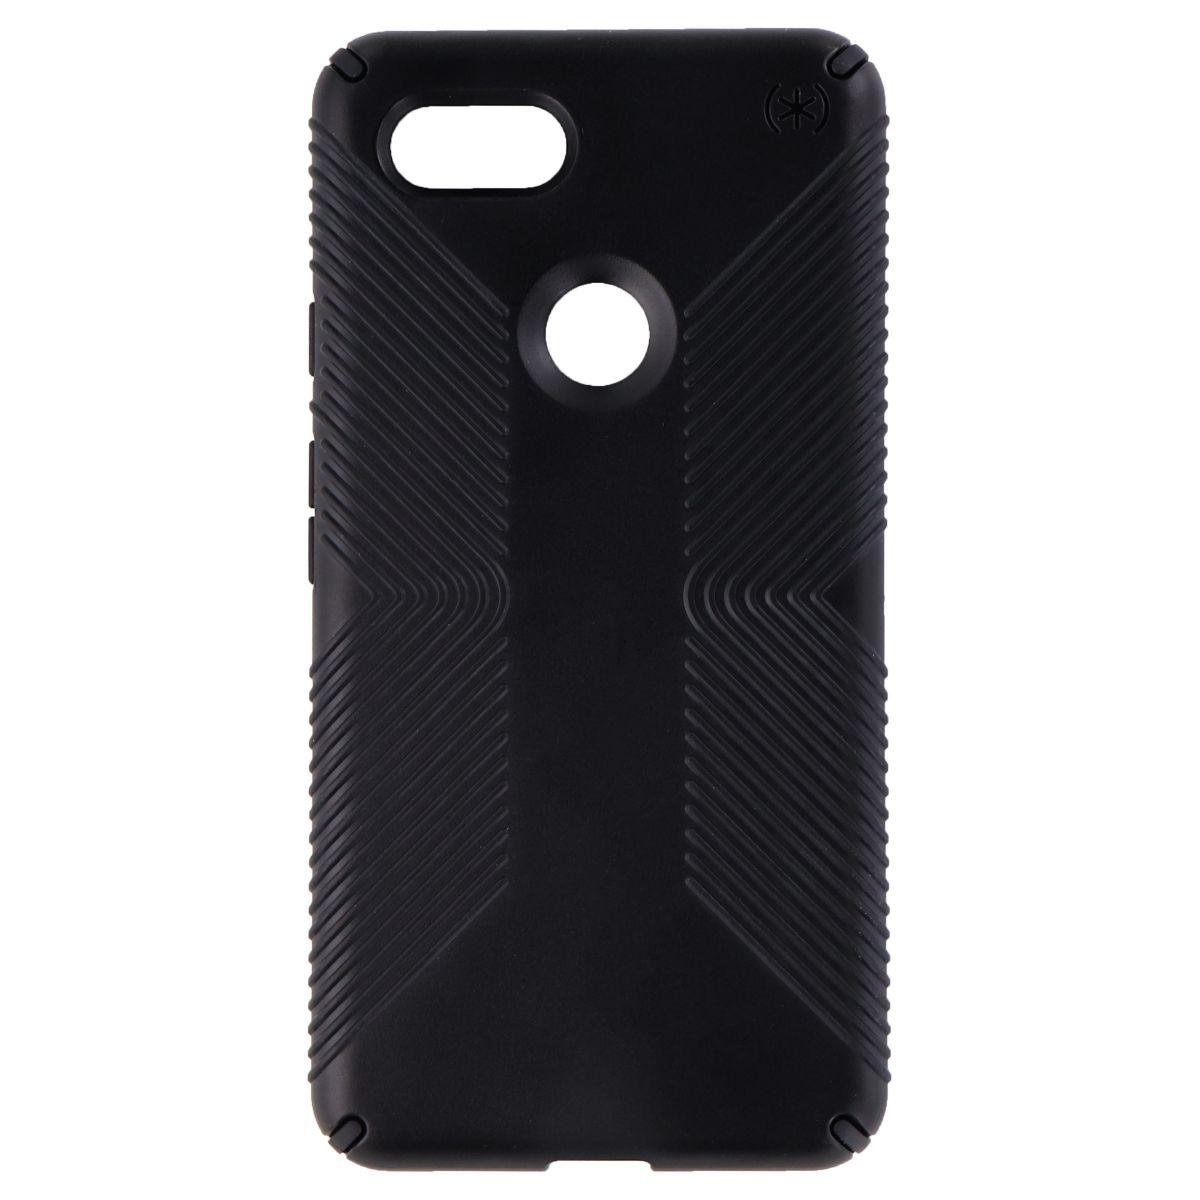 Speck 116426-1050 Presidio Grip Case for Google Pixel 3 XL - Black/Black